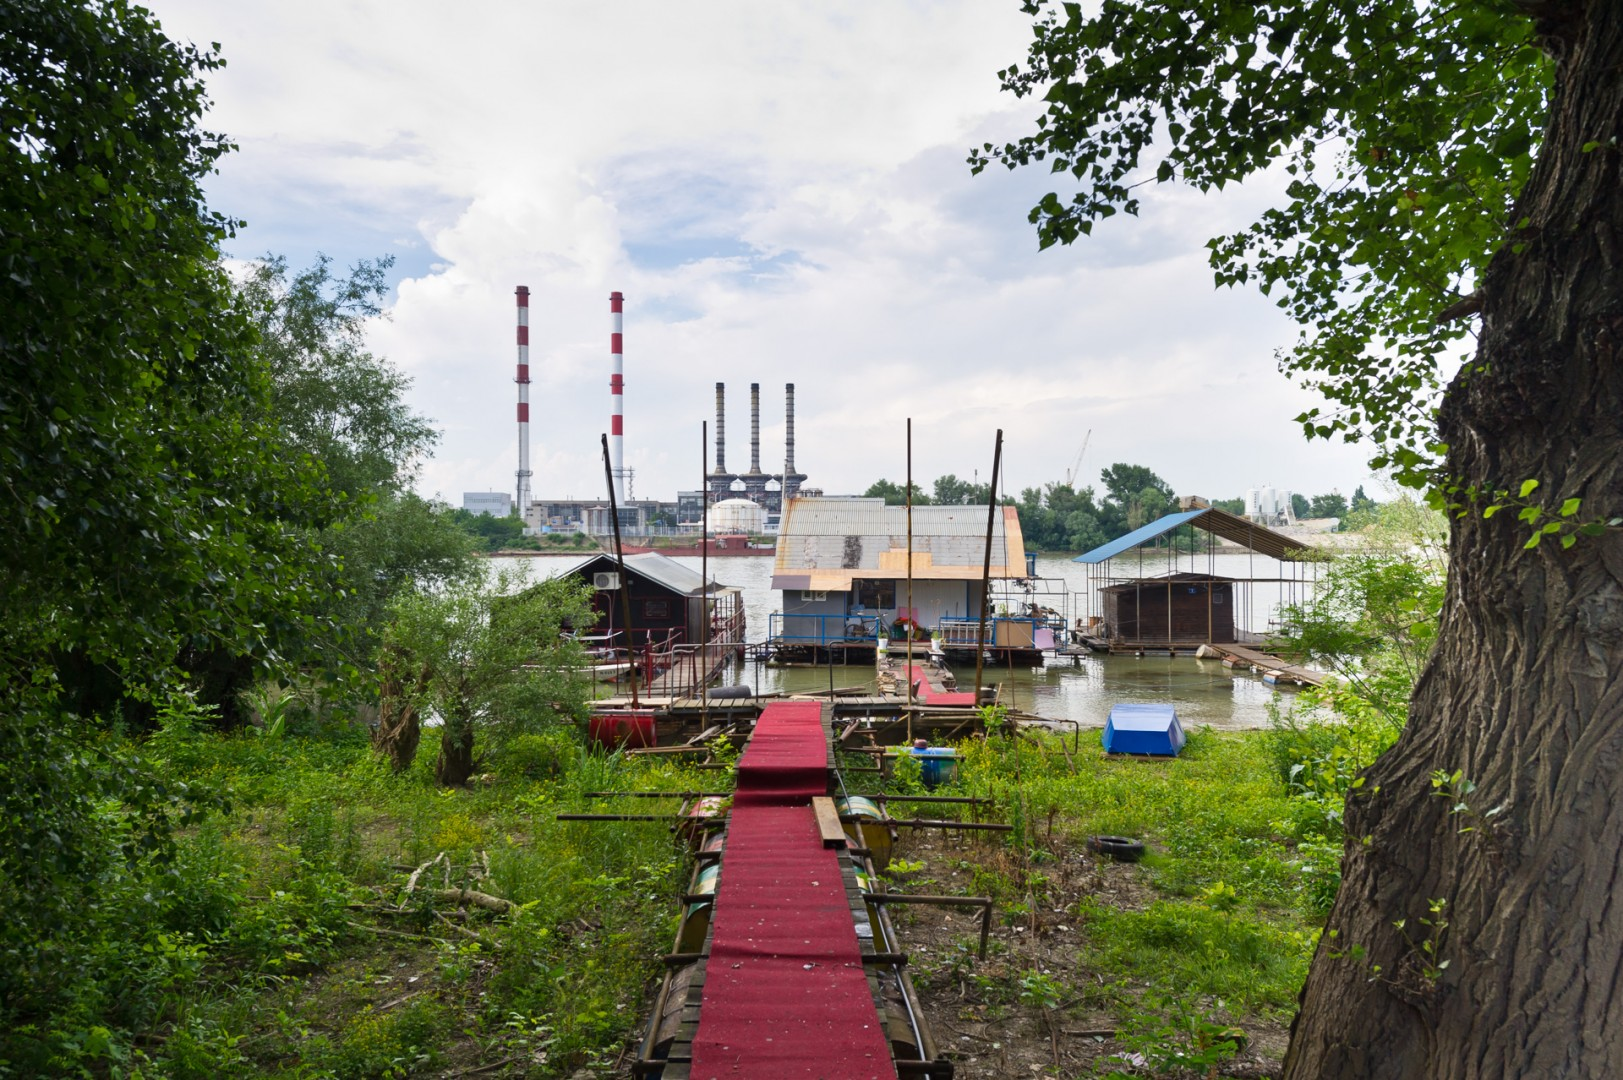 Serbia Serbien Belgrad Kraftwerk Hausboote Floating Homes Schwimmende Häuser